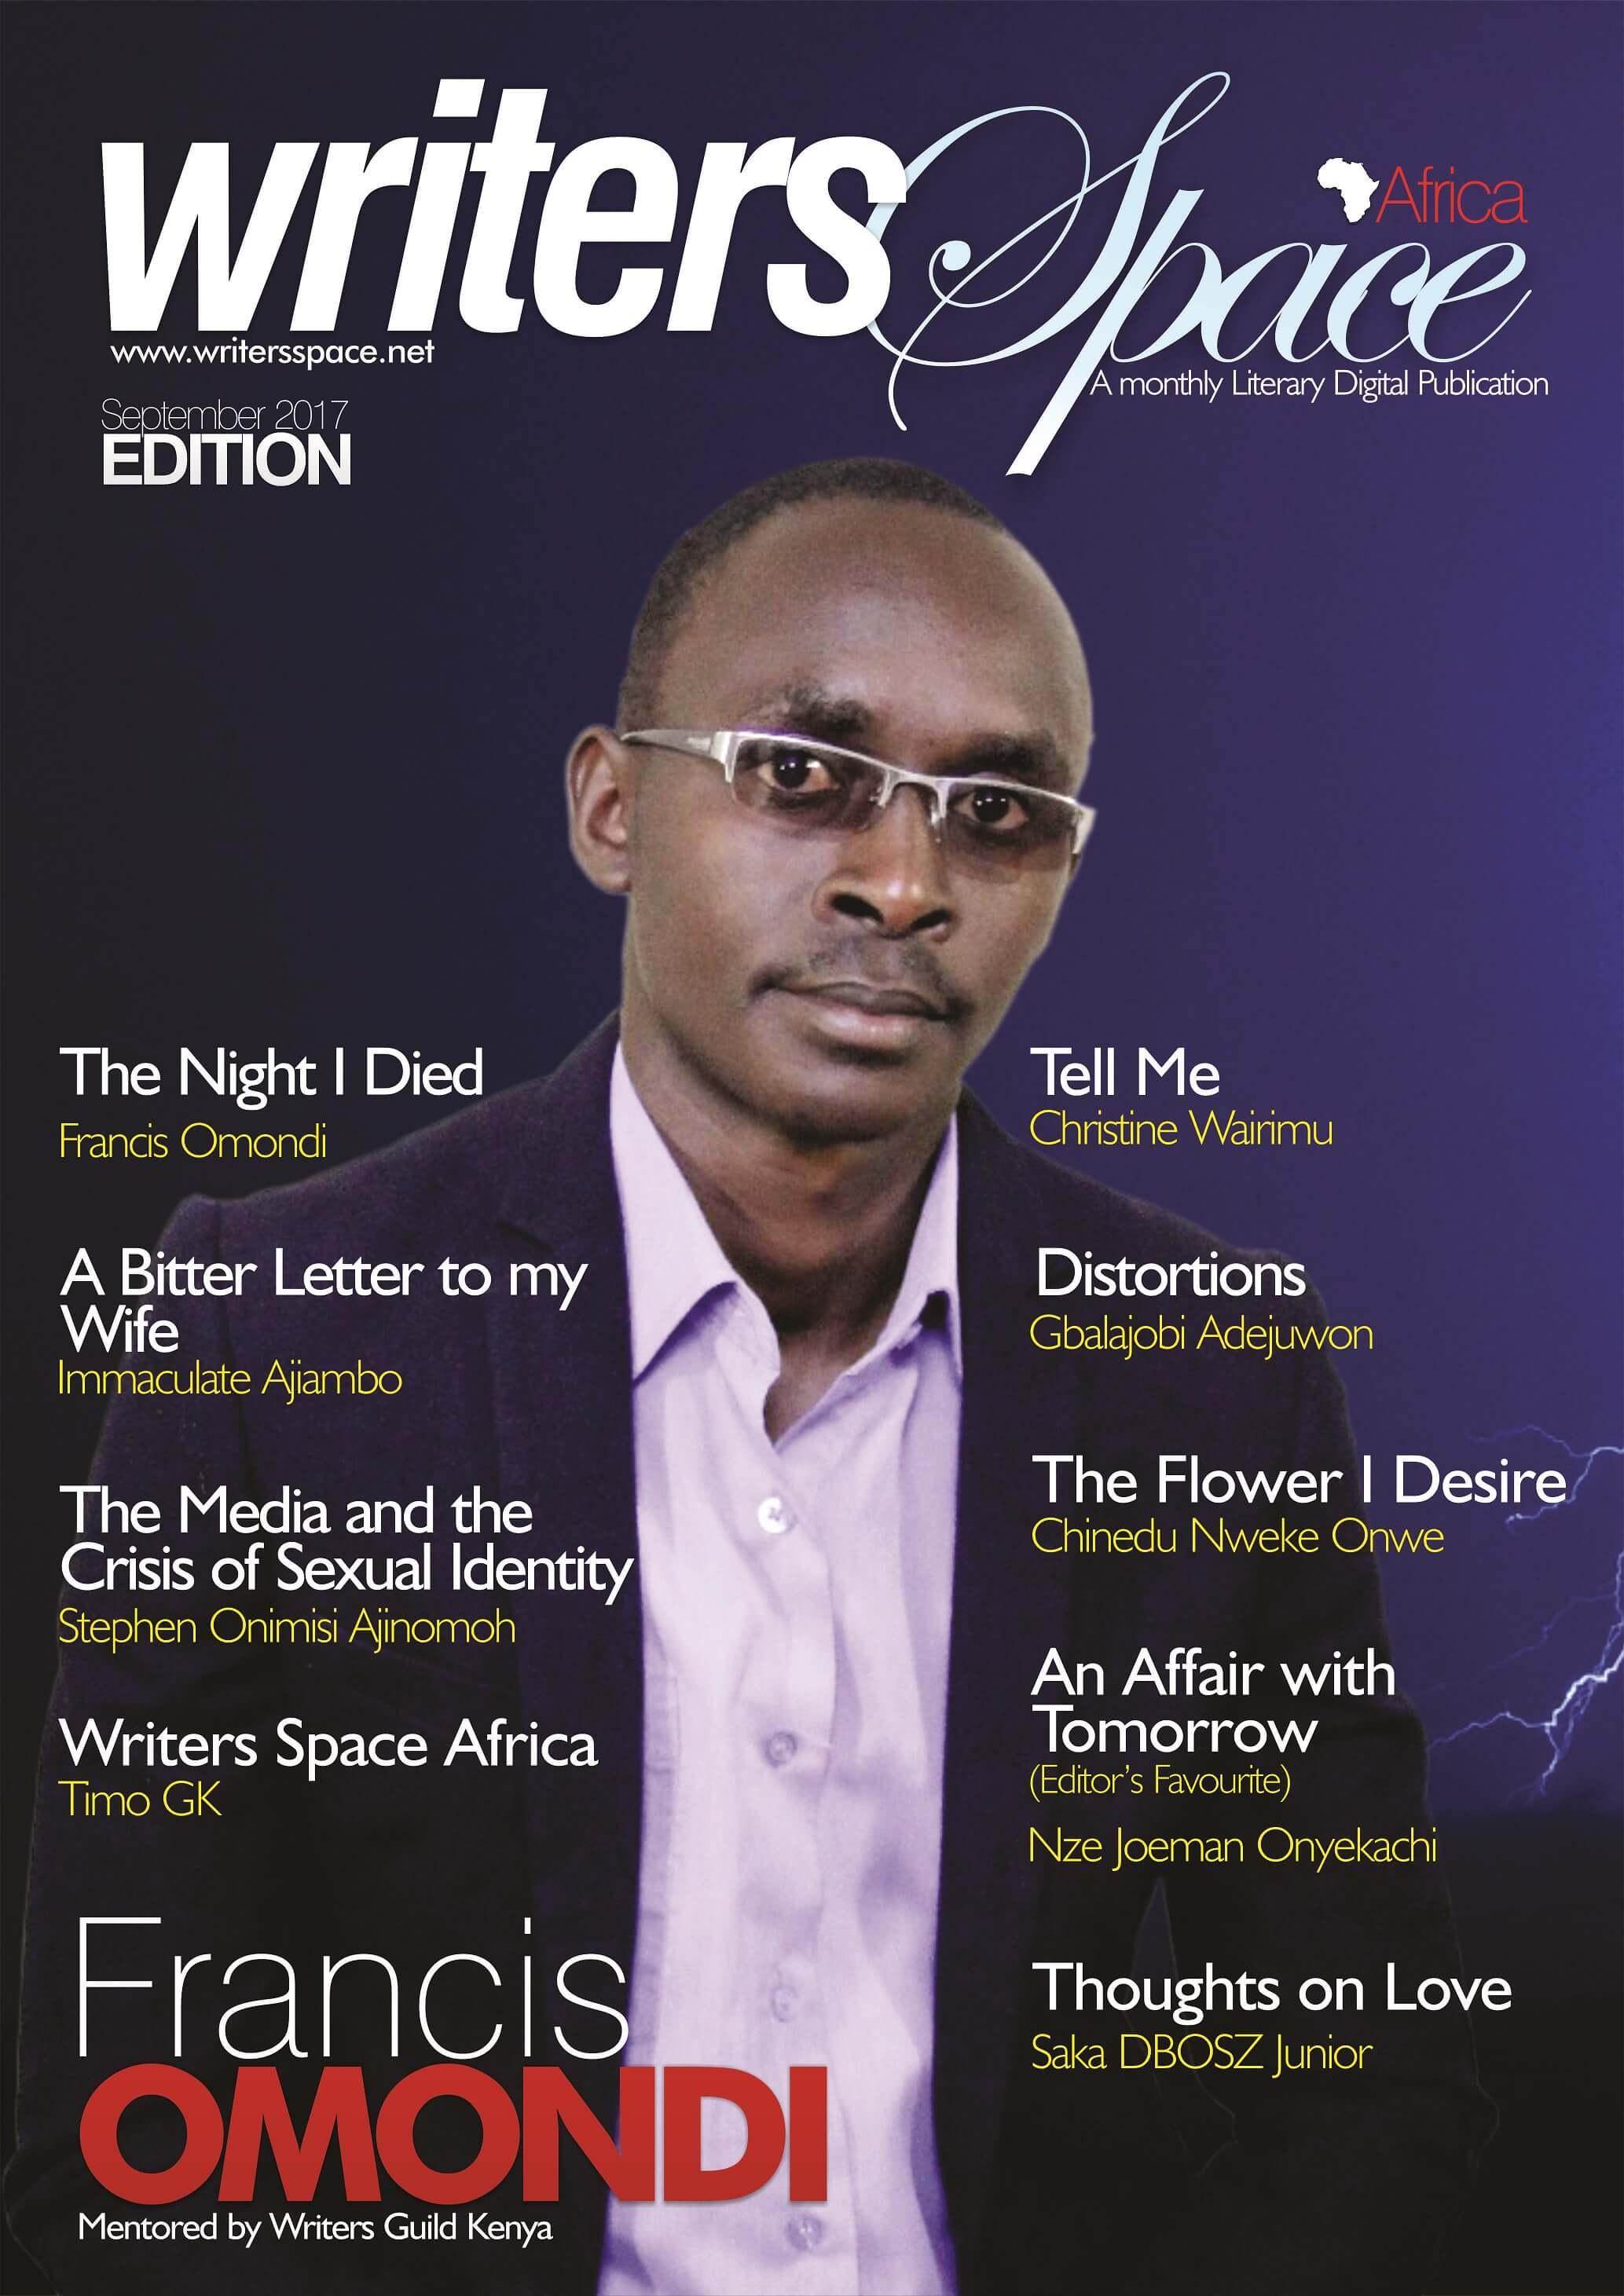 September Literary Publication